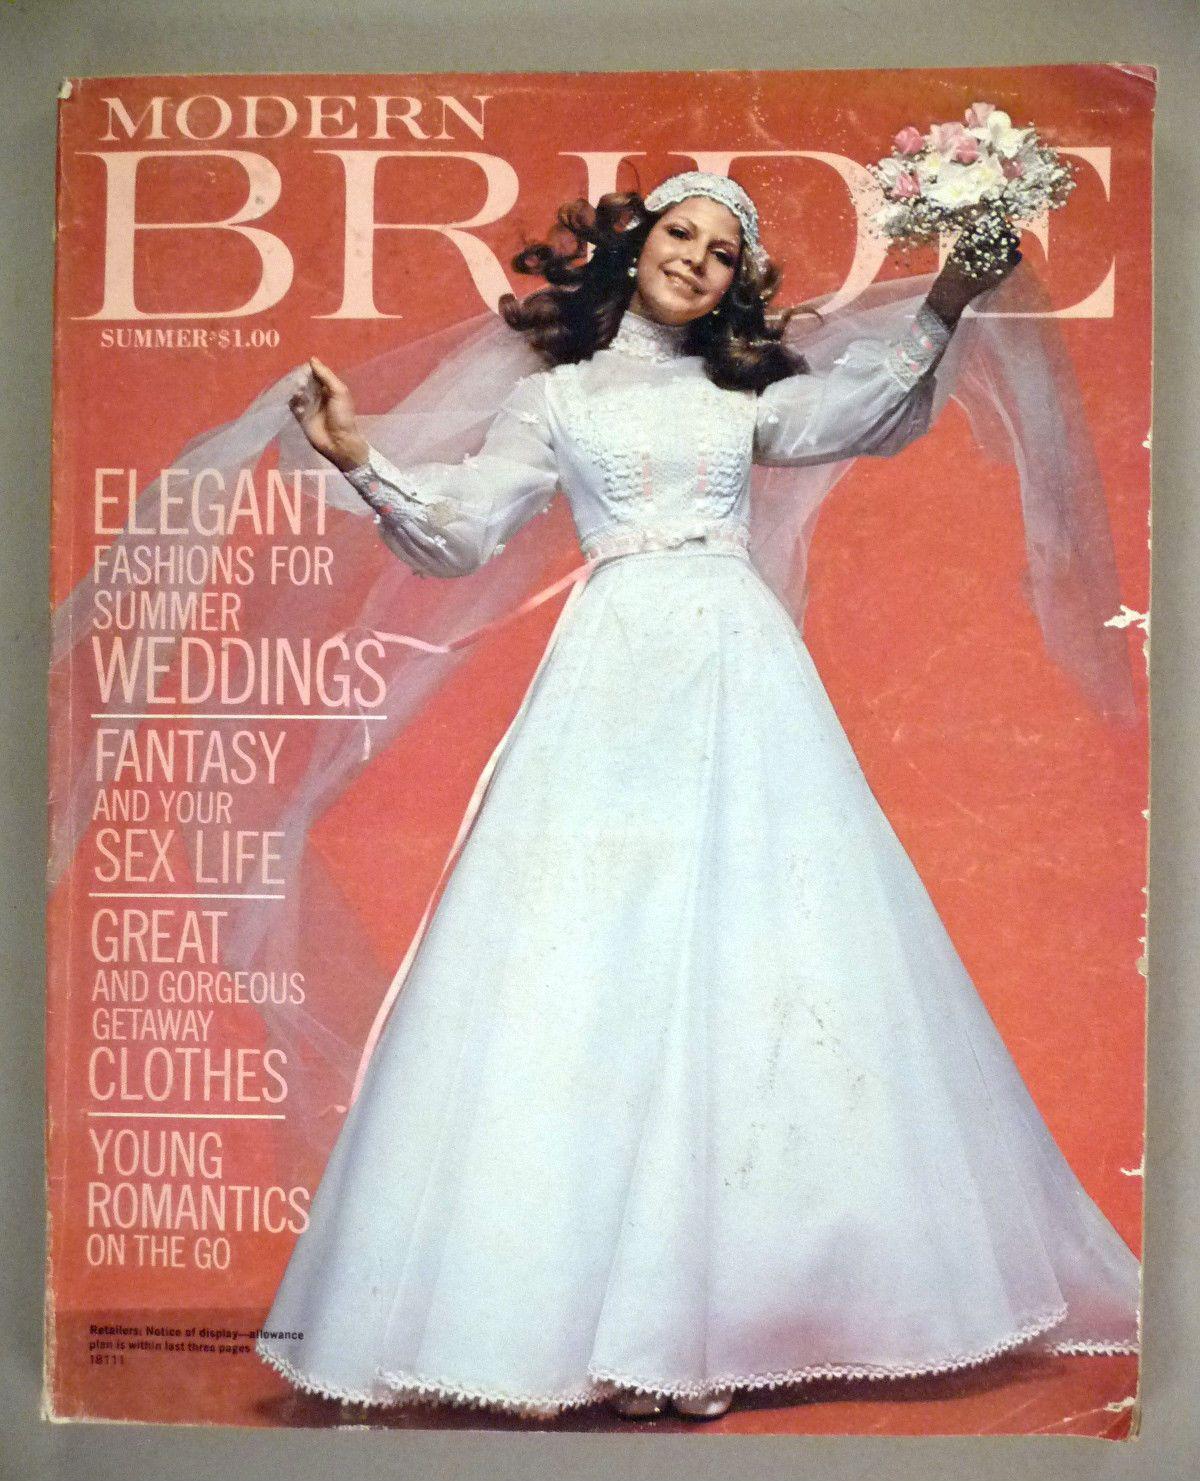 Pin de Liesa en Magazine Covers   Pinterest   Sombreros de boda y Boda